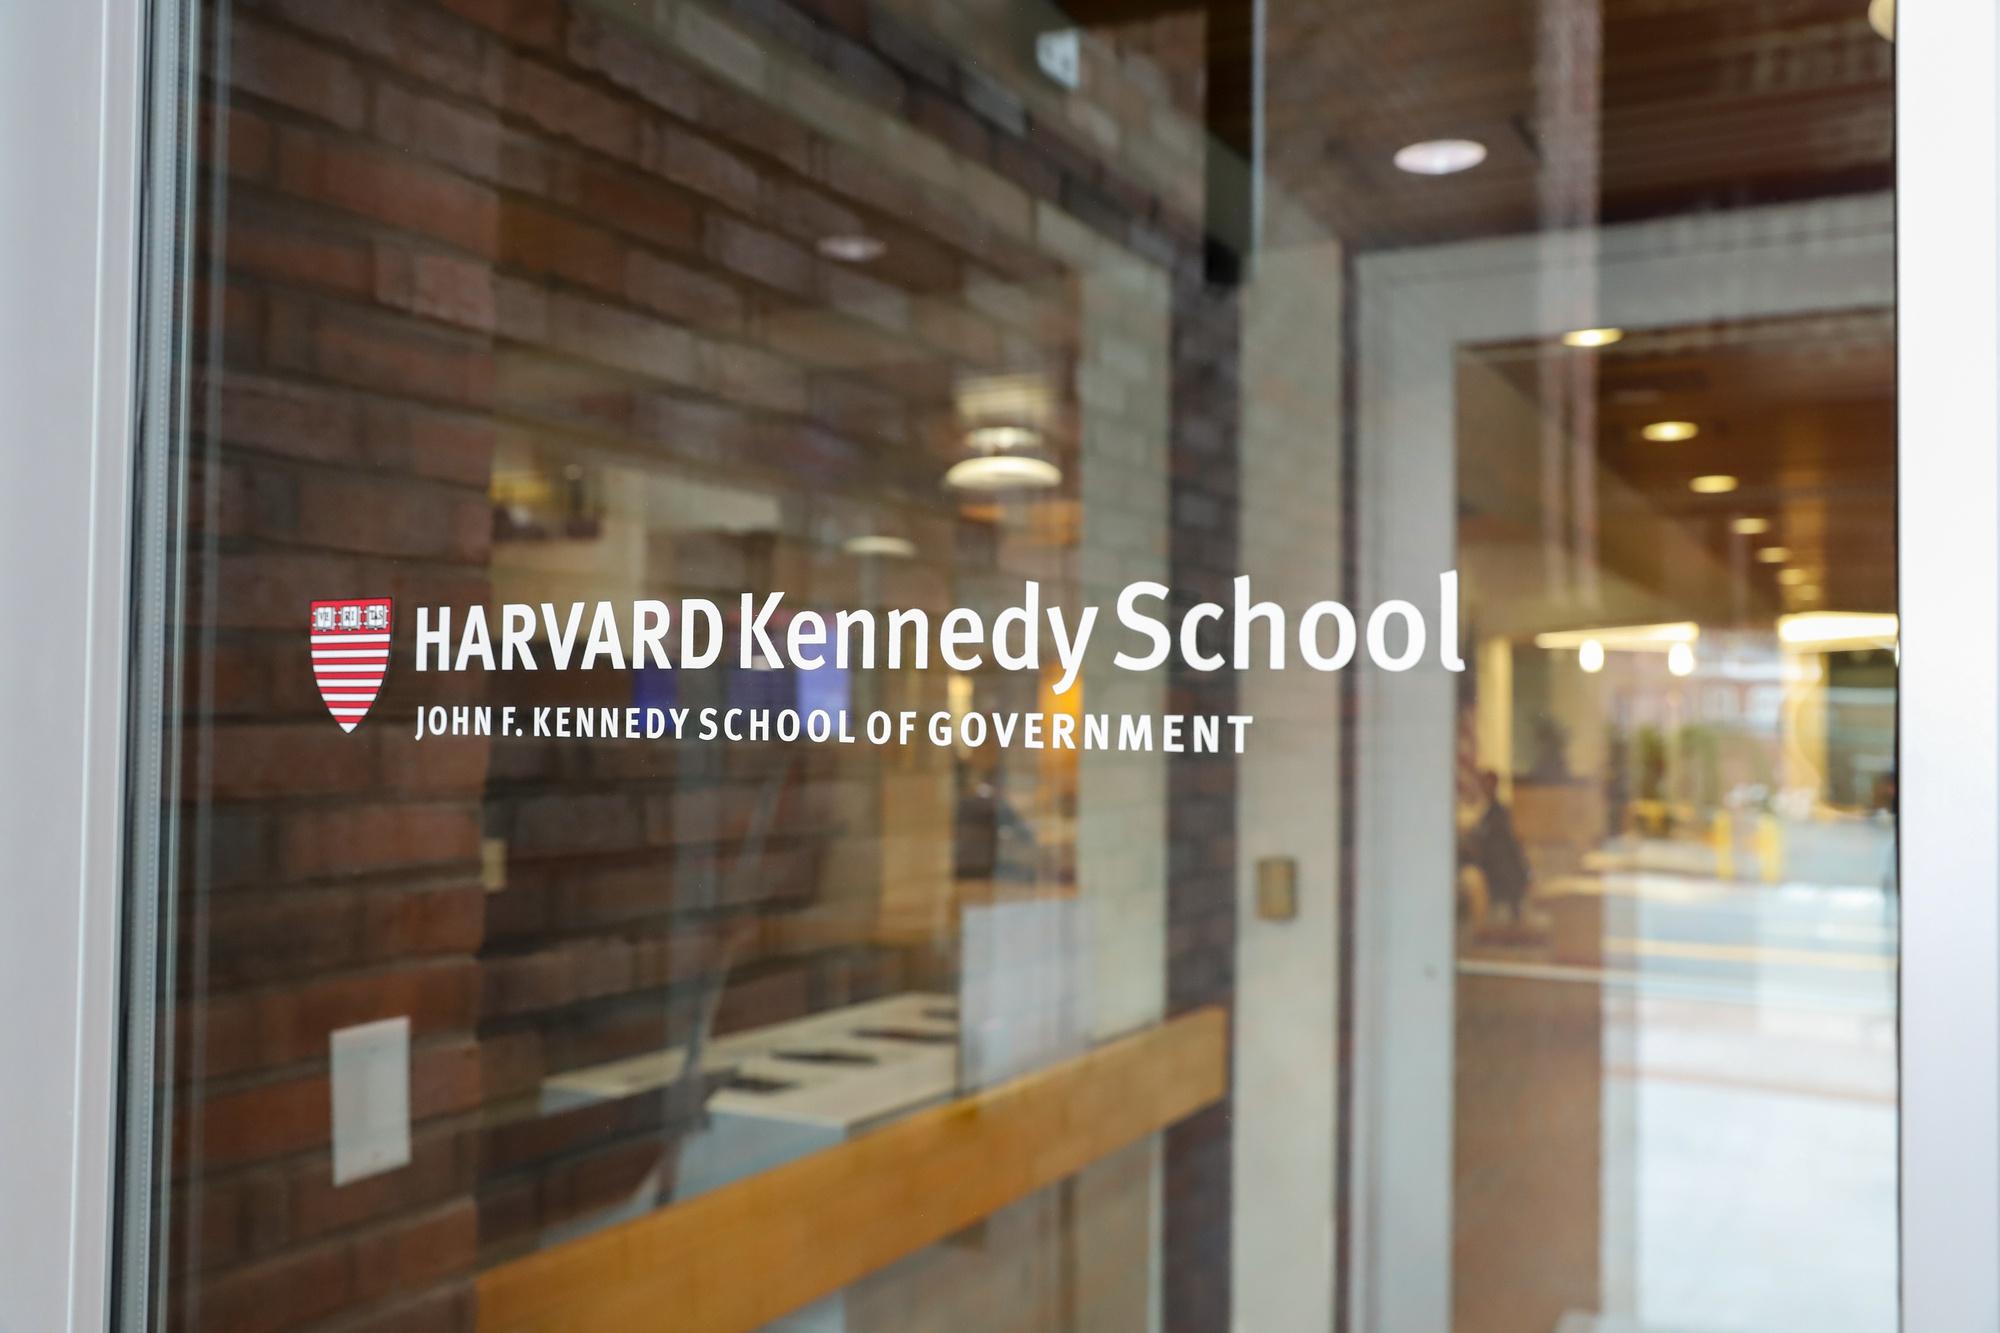 Harvard Kennedy School Students Grapple with Spring 2021 Decision | News | The Harvard Crimson